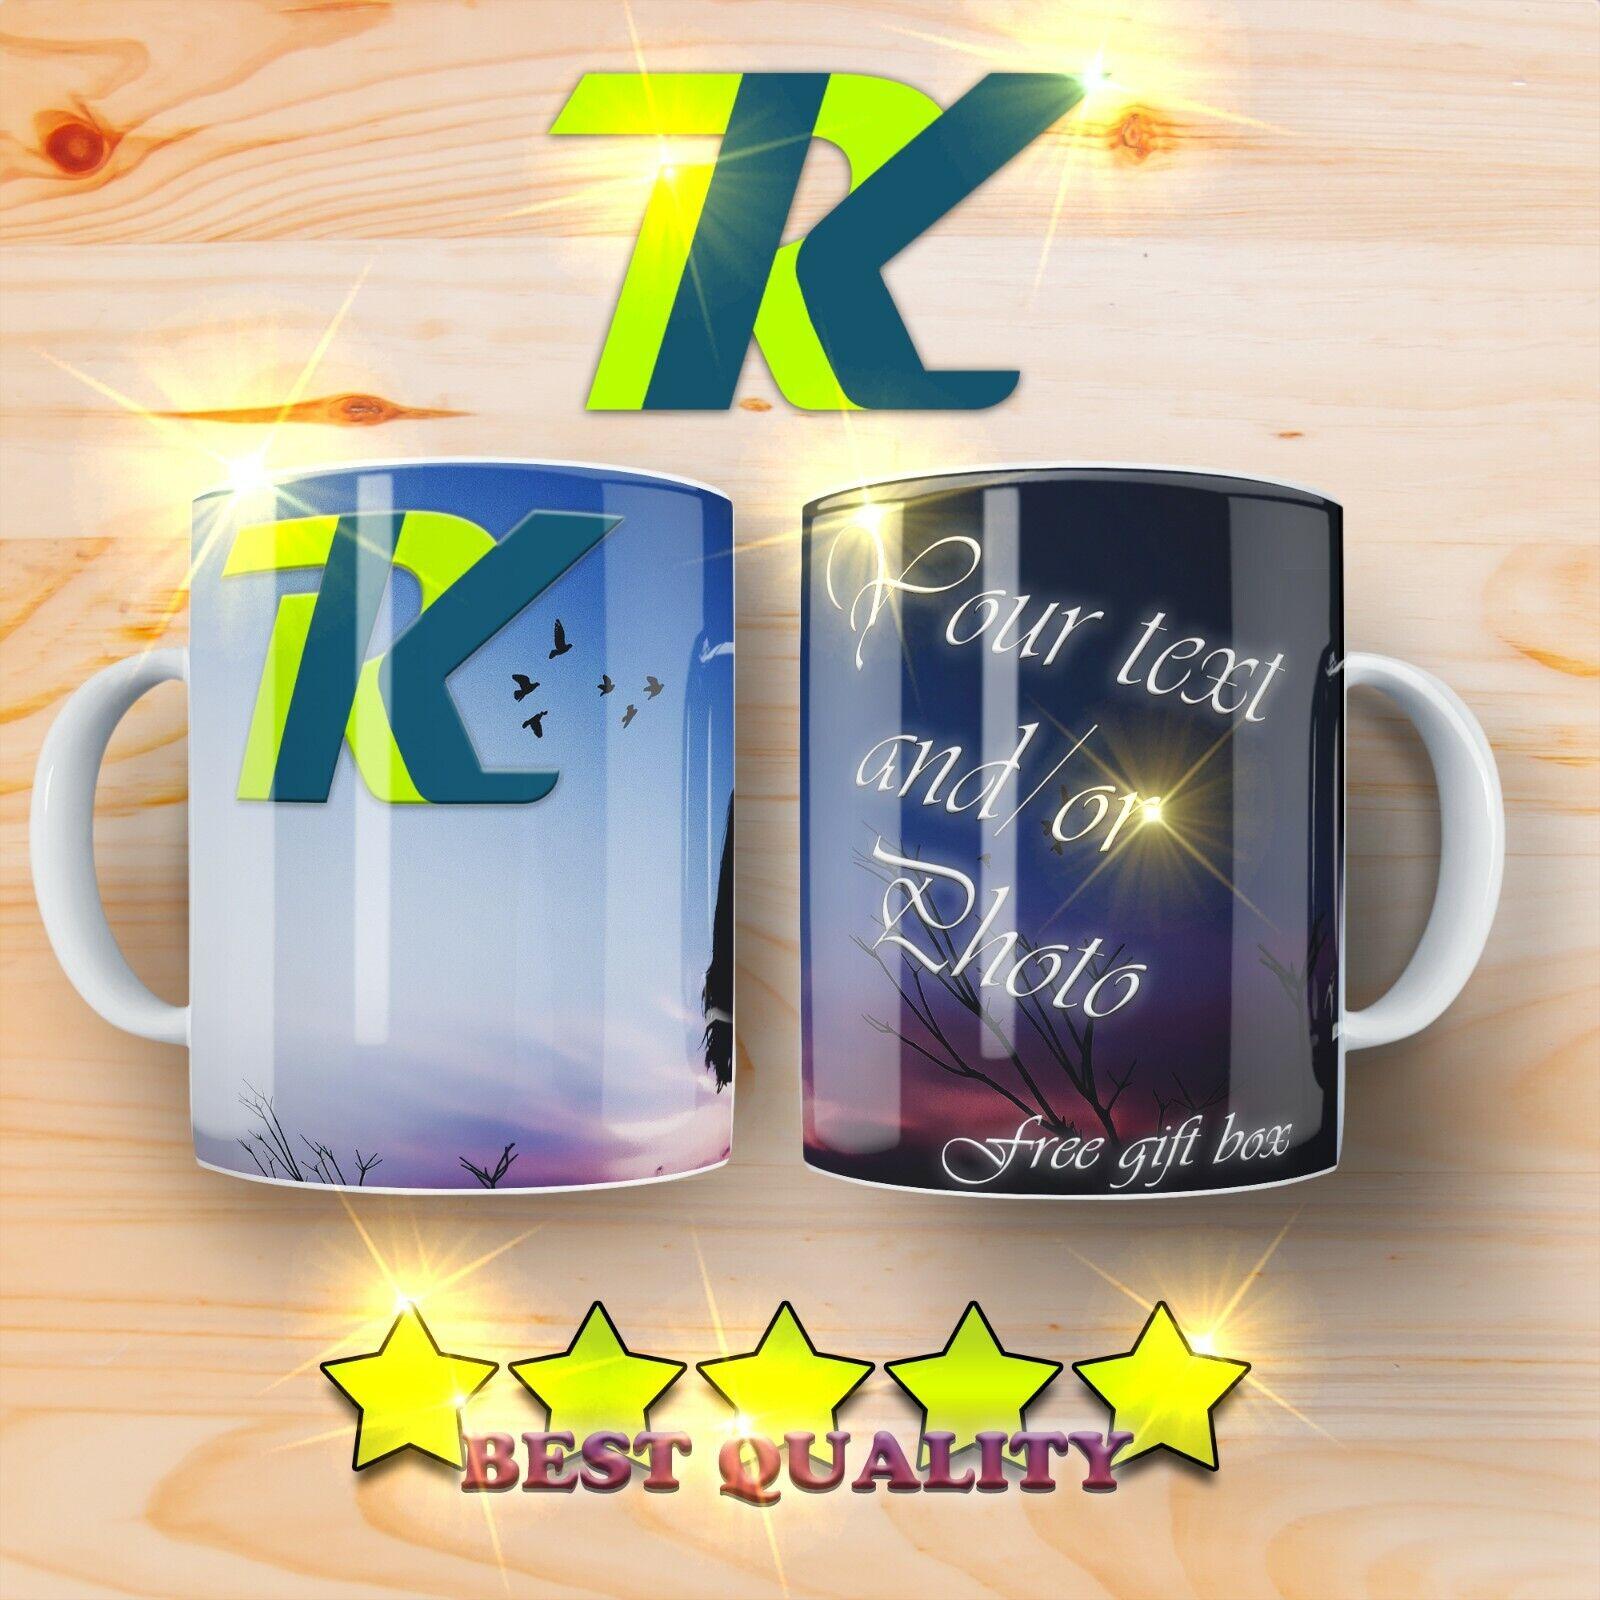 Gift Personalised Photo Mug Custom Cup Text Image Name Logo Fathers Day Birthday